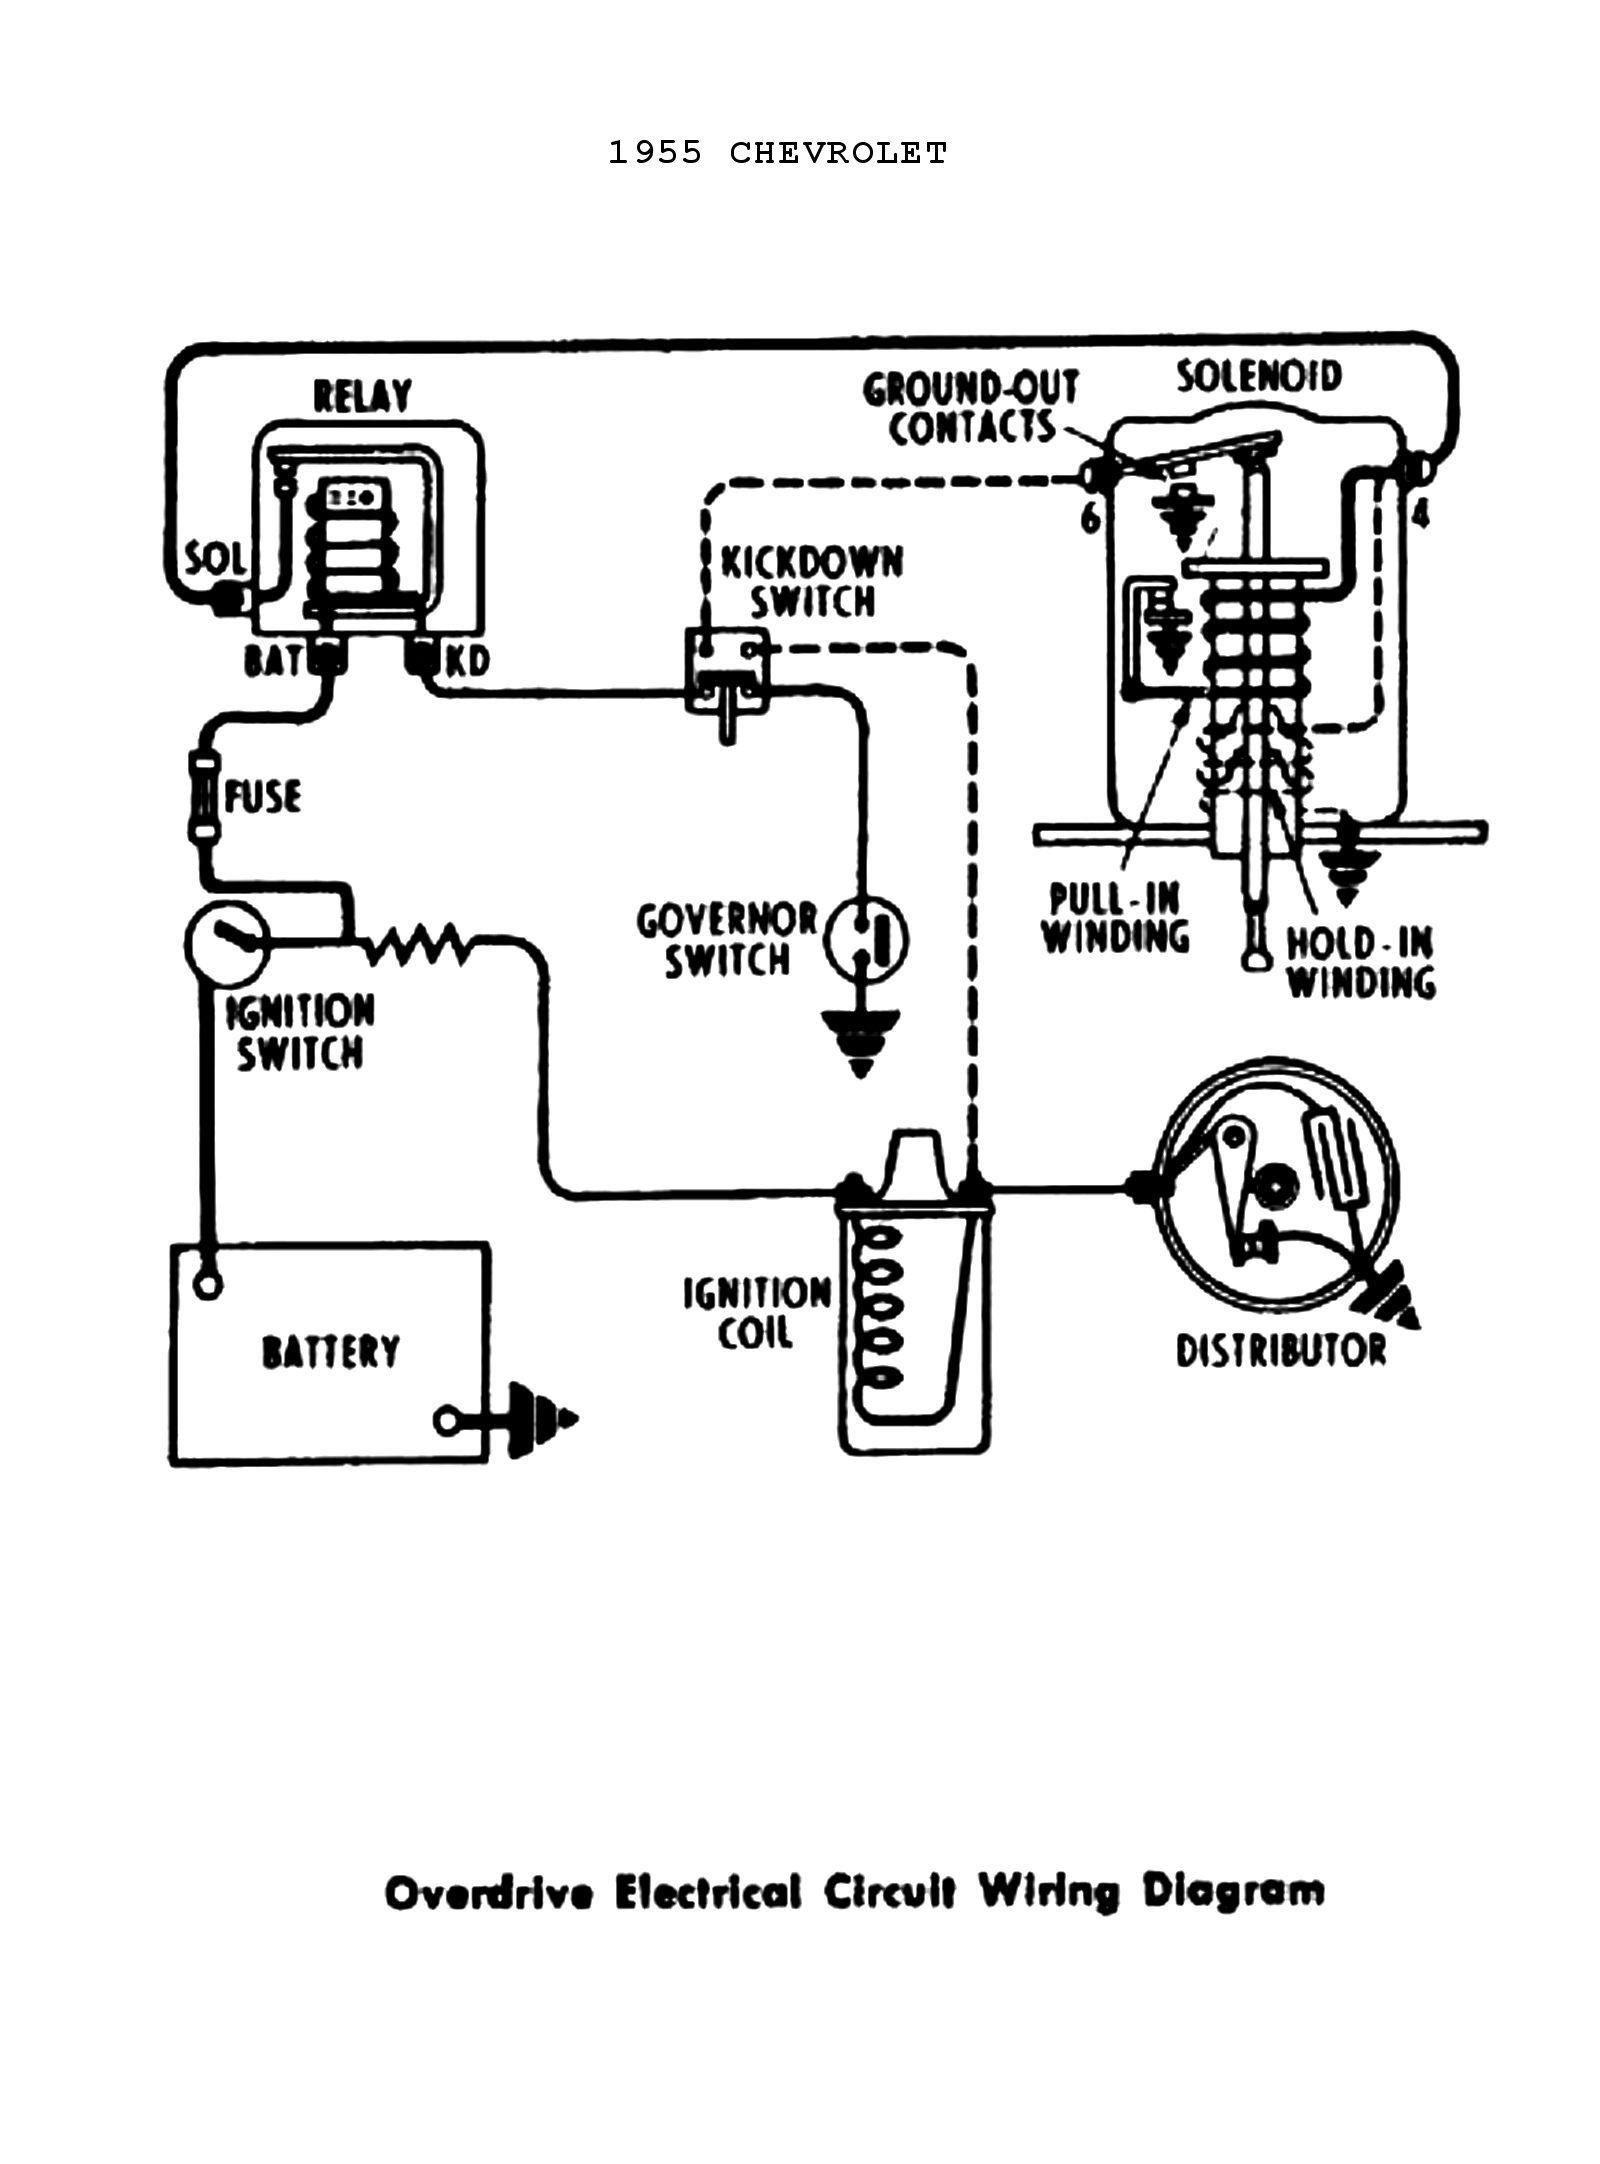 ram door lock wire diagram wiring diagram of ignition system ignition coil  wiring diagram of ignition system